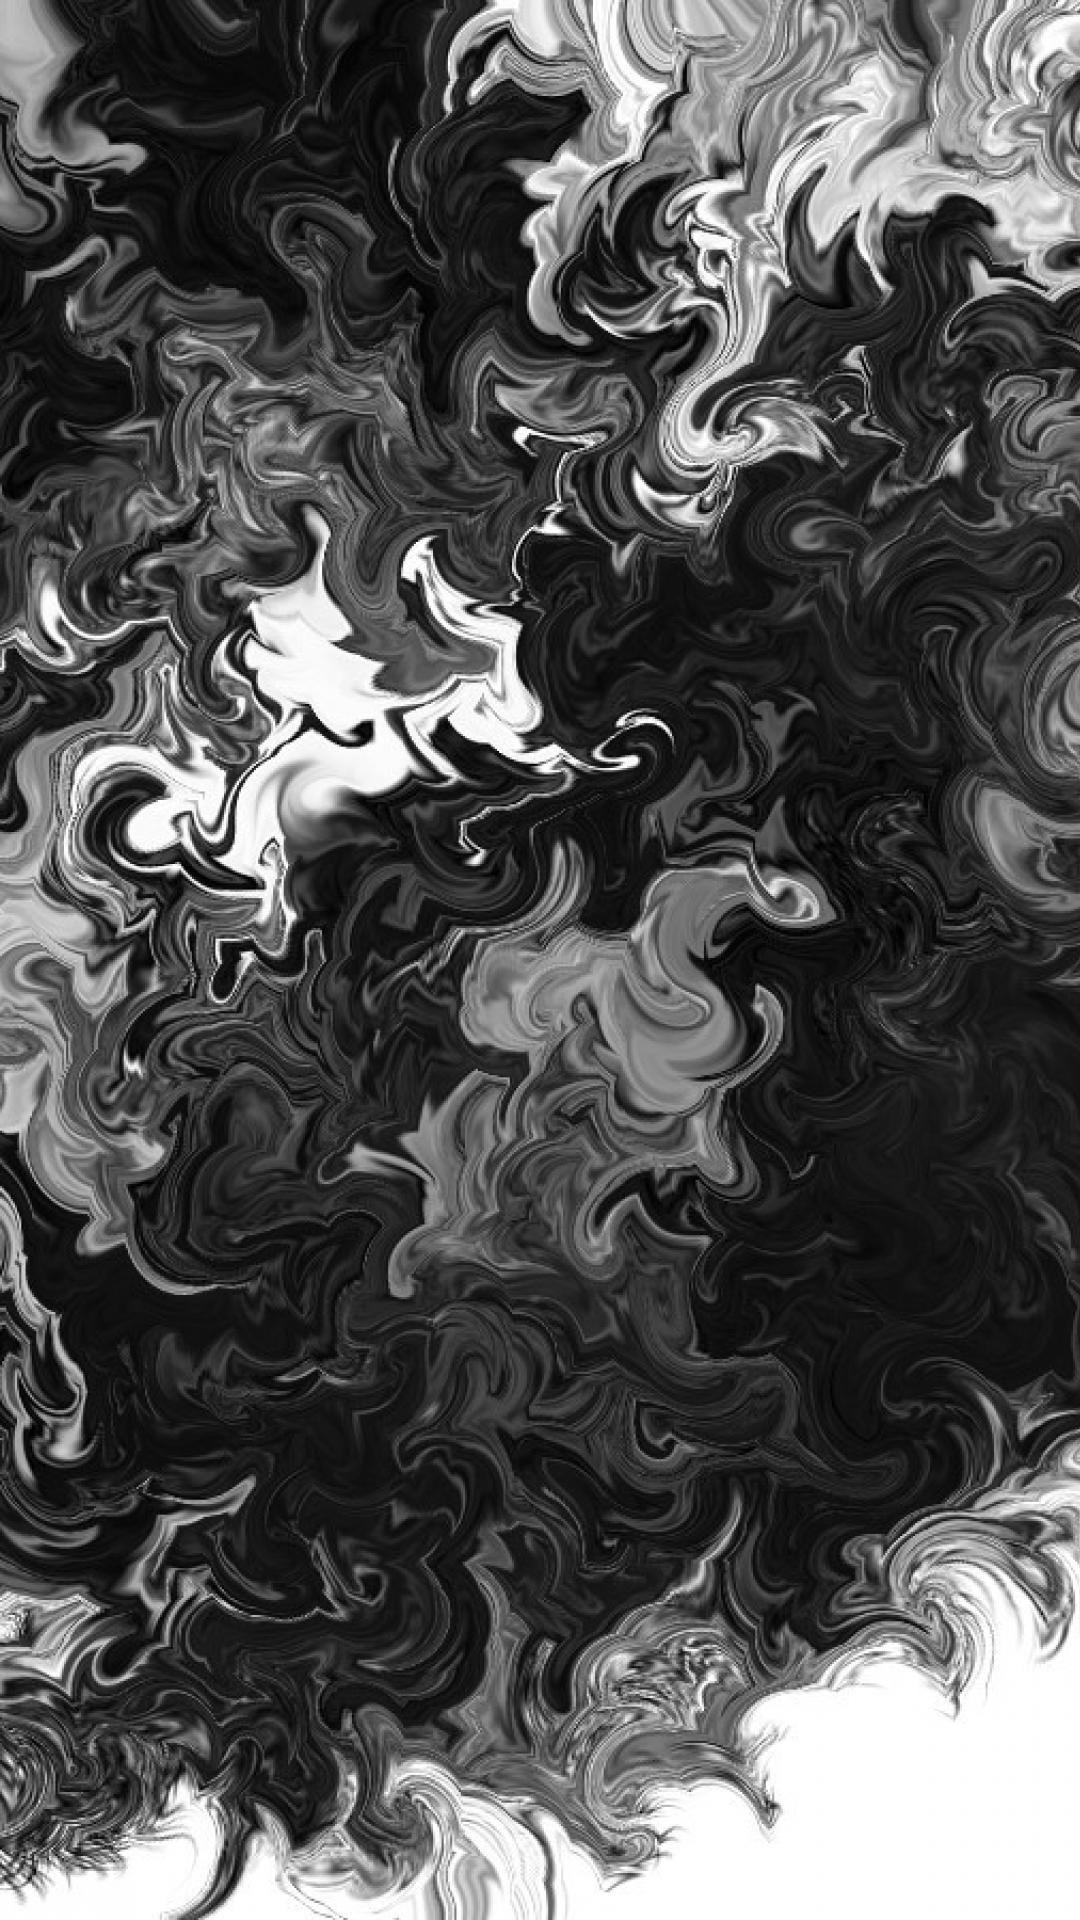 Pin By Mohd Arif On Wallpaper Black Hd Wallpaper Black And White Abstract Abstract Wallpaper